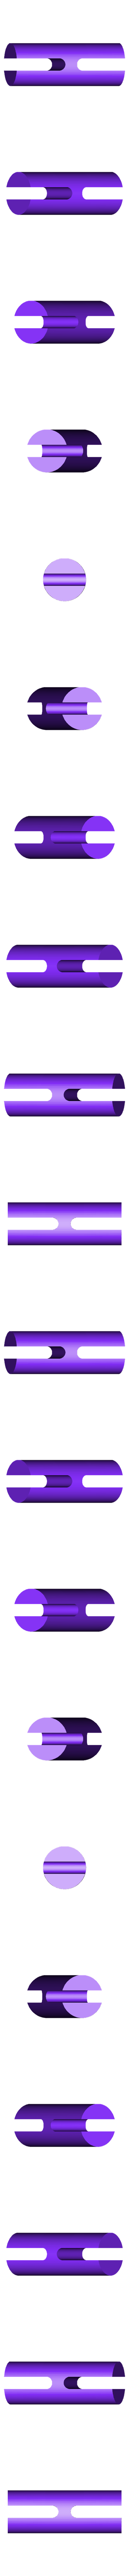 Castle_Pin_2.stl Download free STL file Castle Dedede - Amiibo Prop • 3D printable object, ChrisBobo